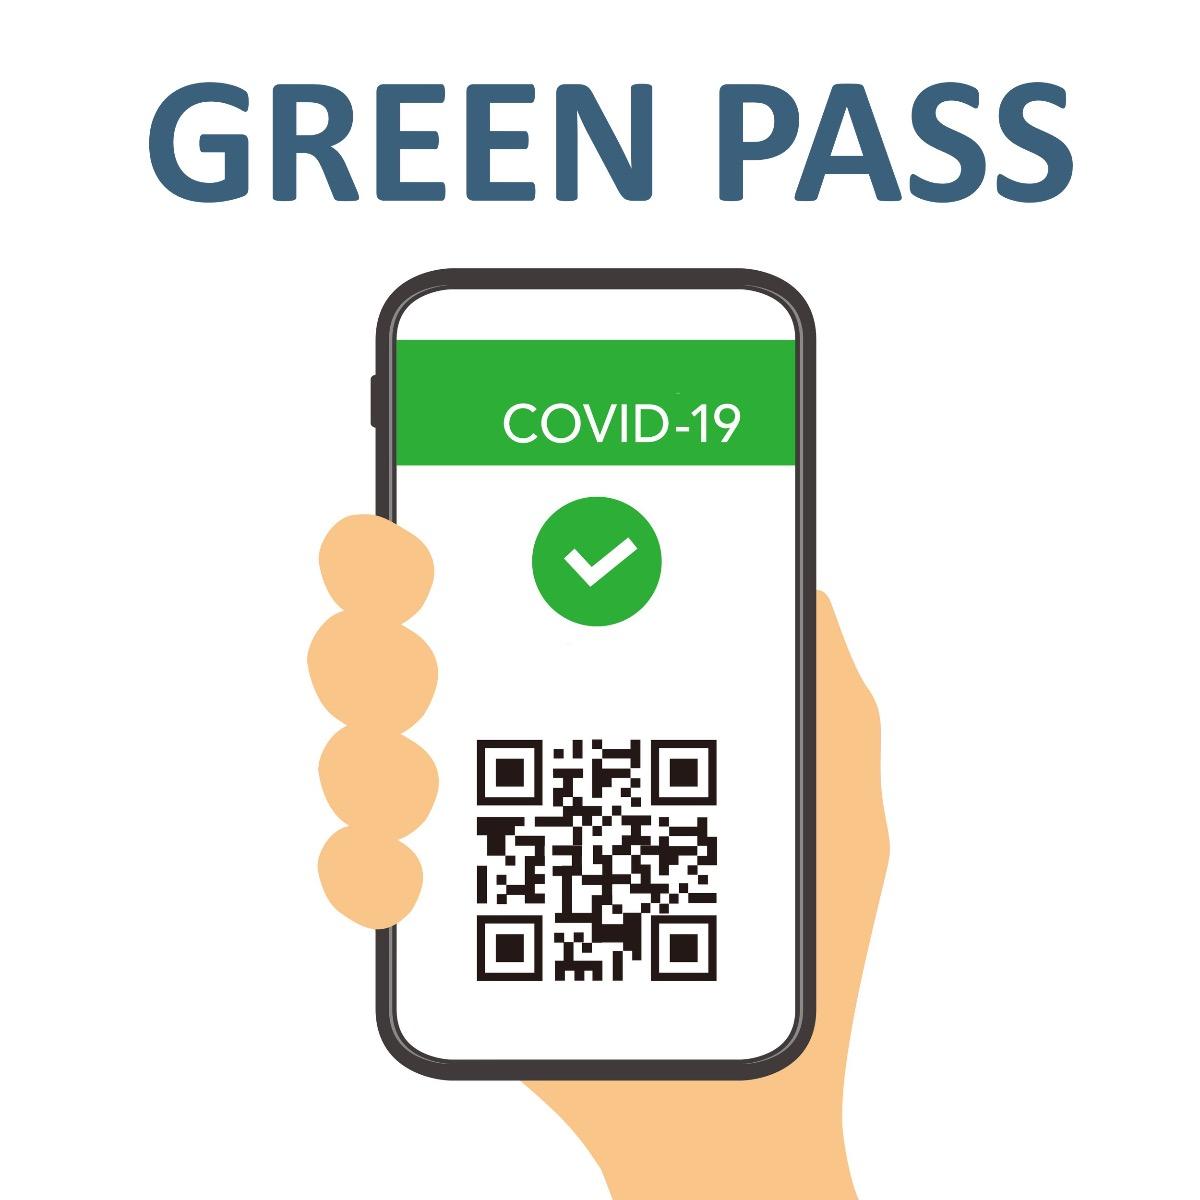 AVVISO GREEN PASS